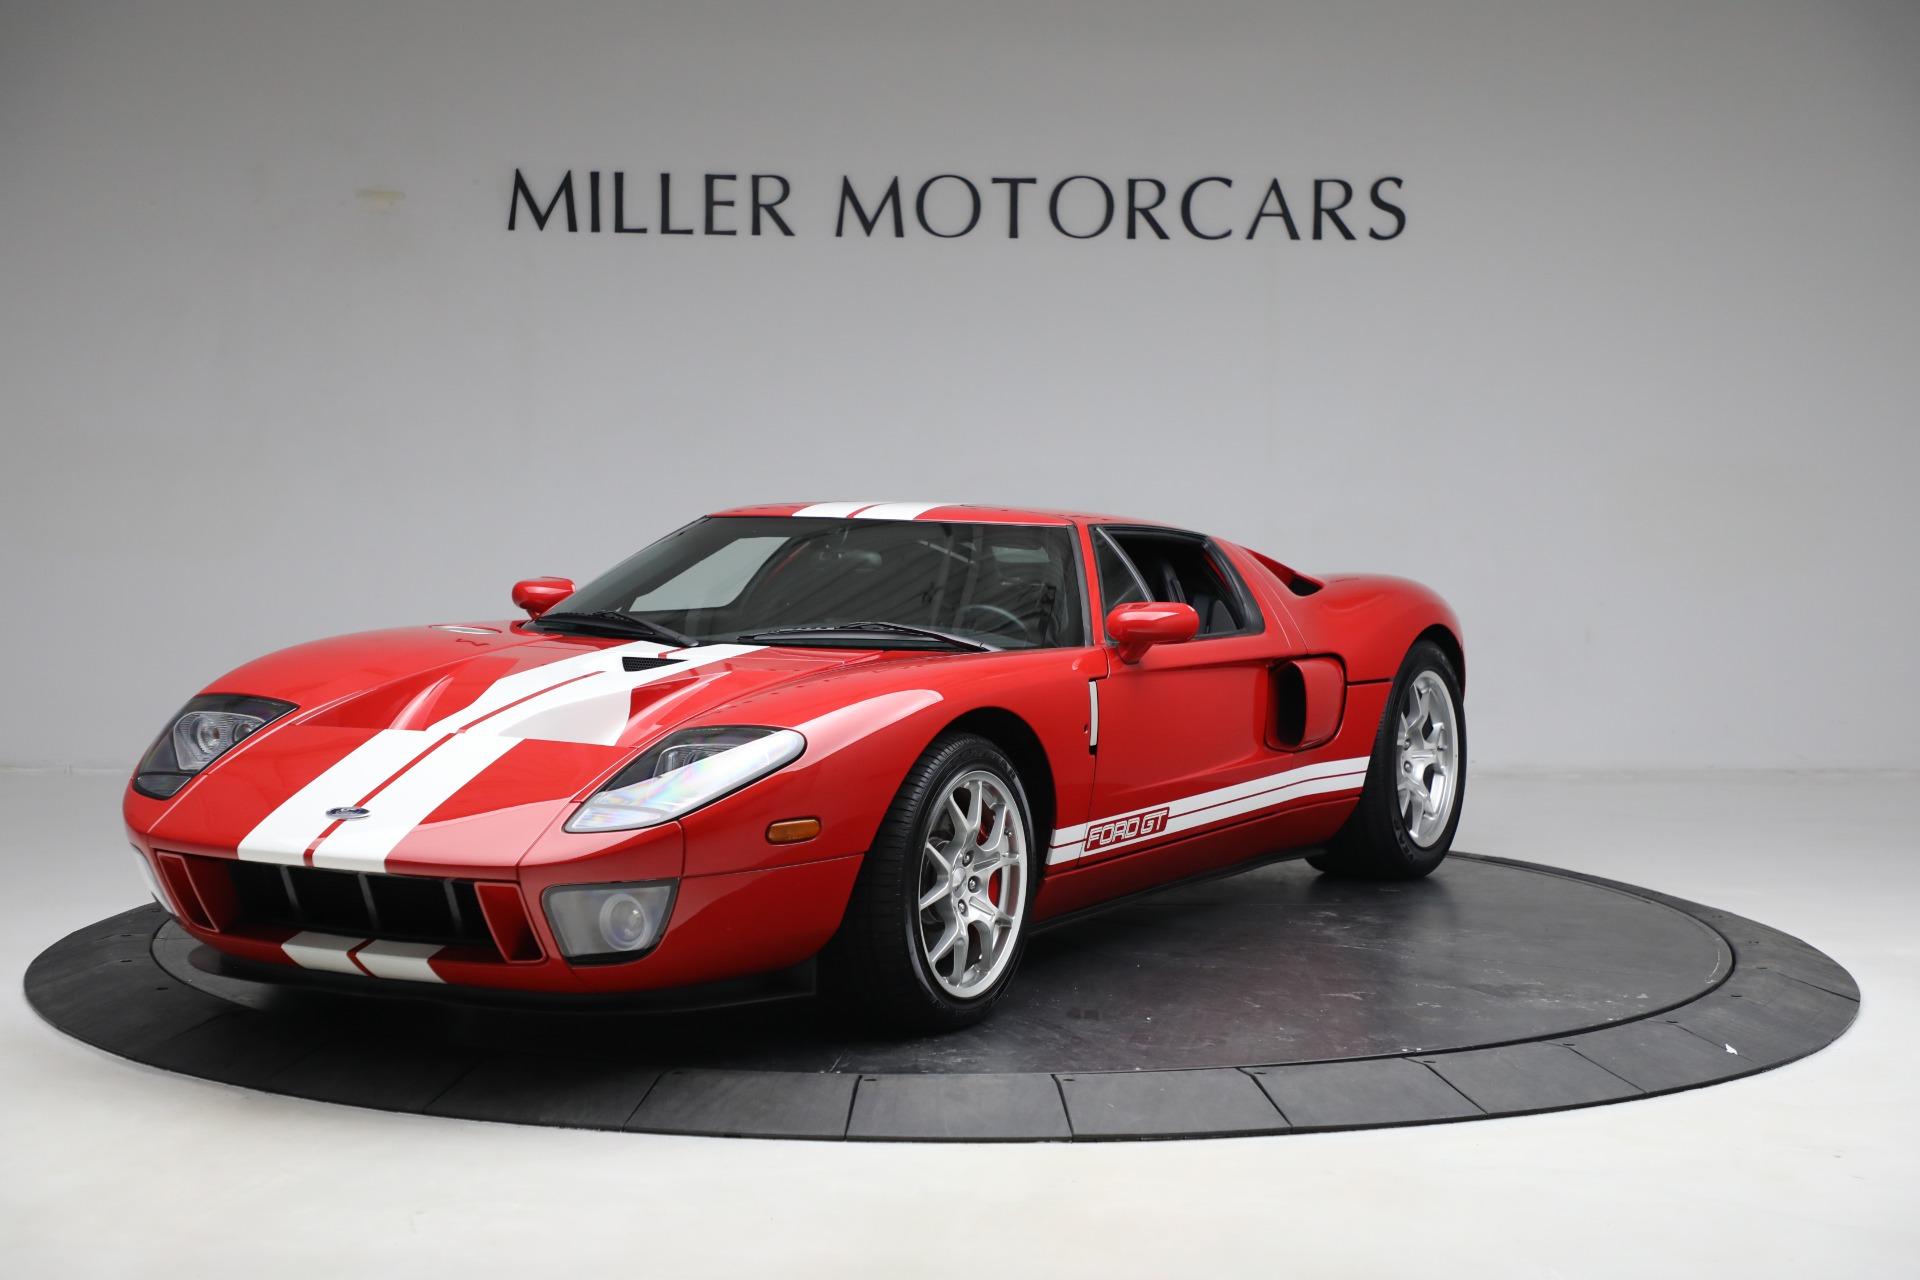 Used 1966 Meyers Manx Dune Buggy for sale $65,900 at Alfa Romeo of Westport in Westport CT 06880 1